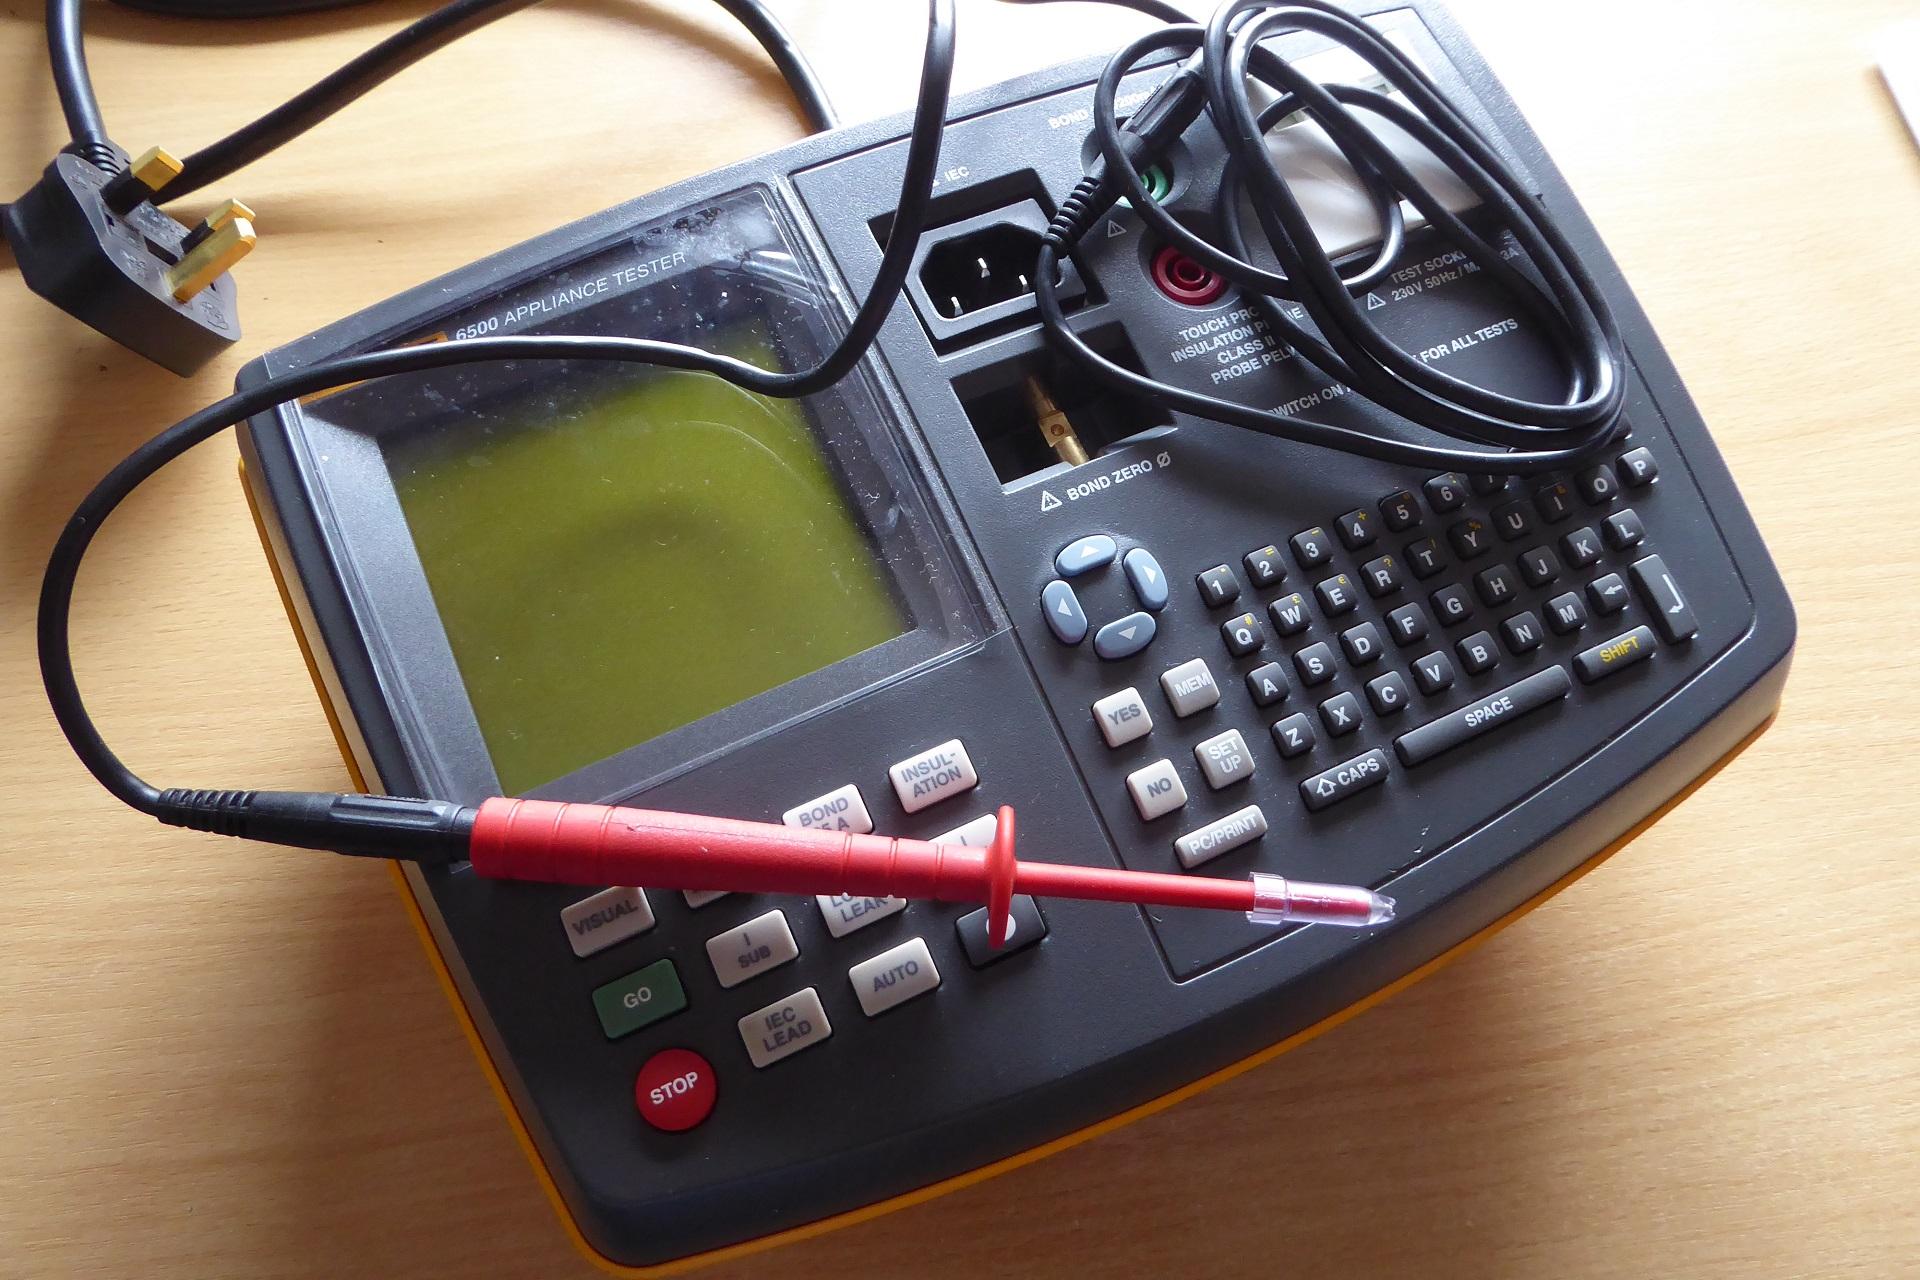 S B Electrical Pat Testing